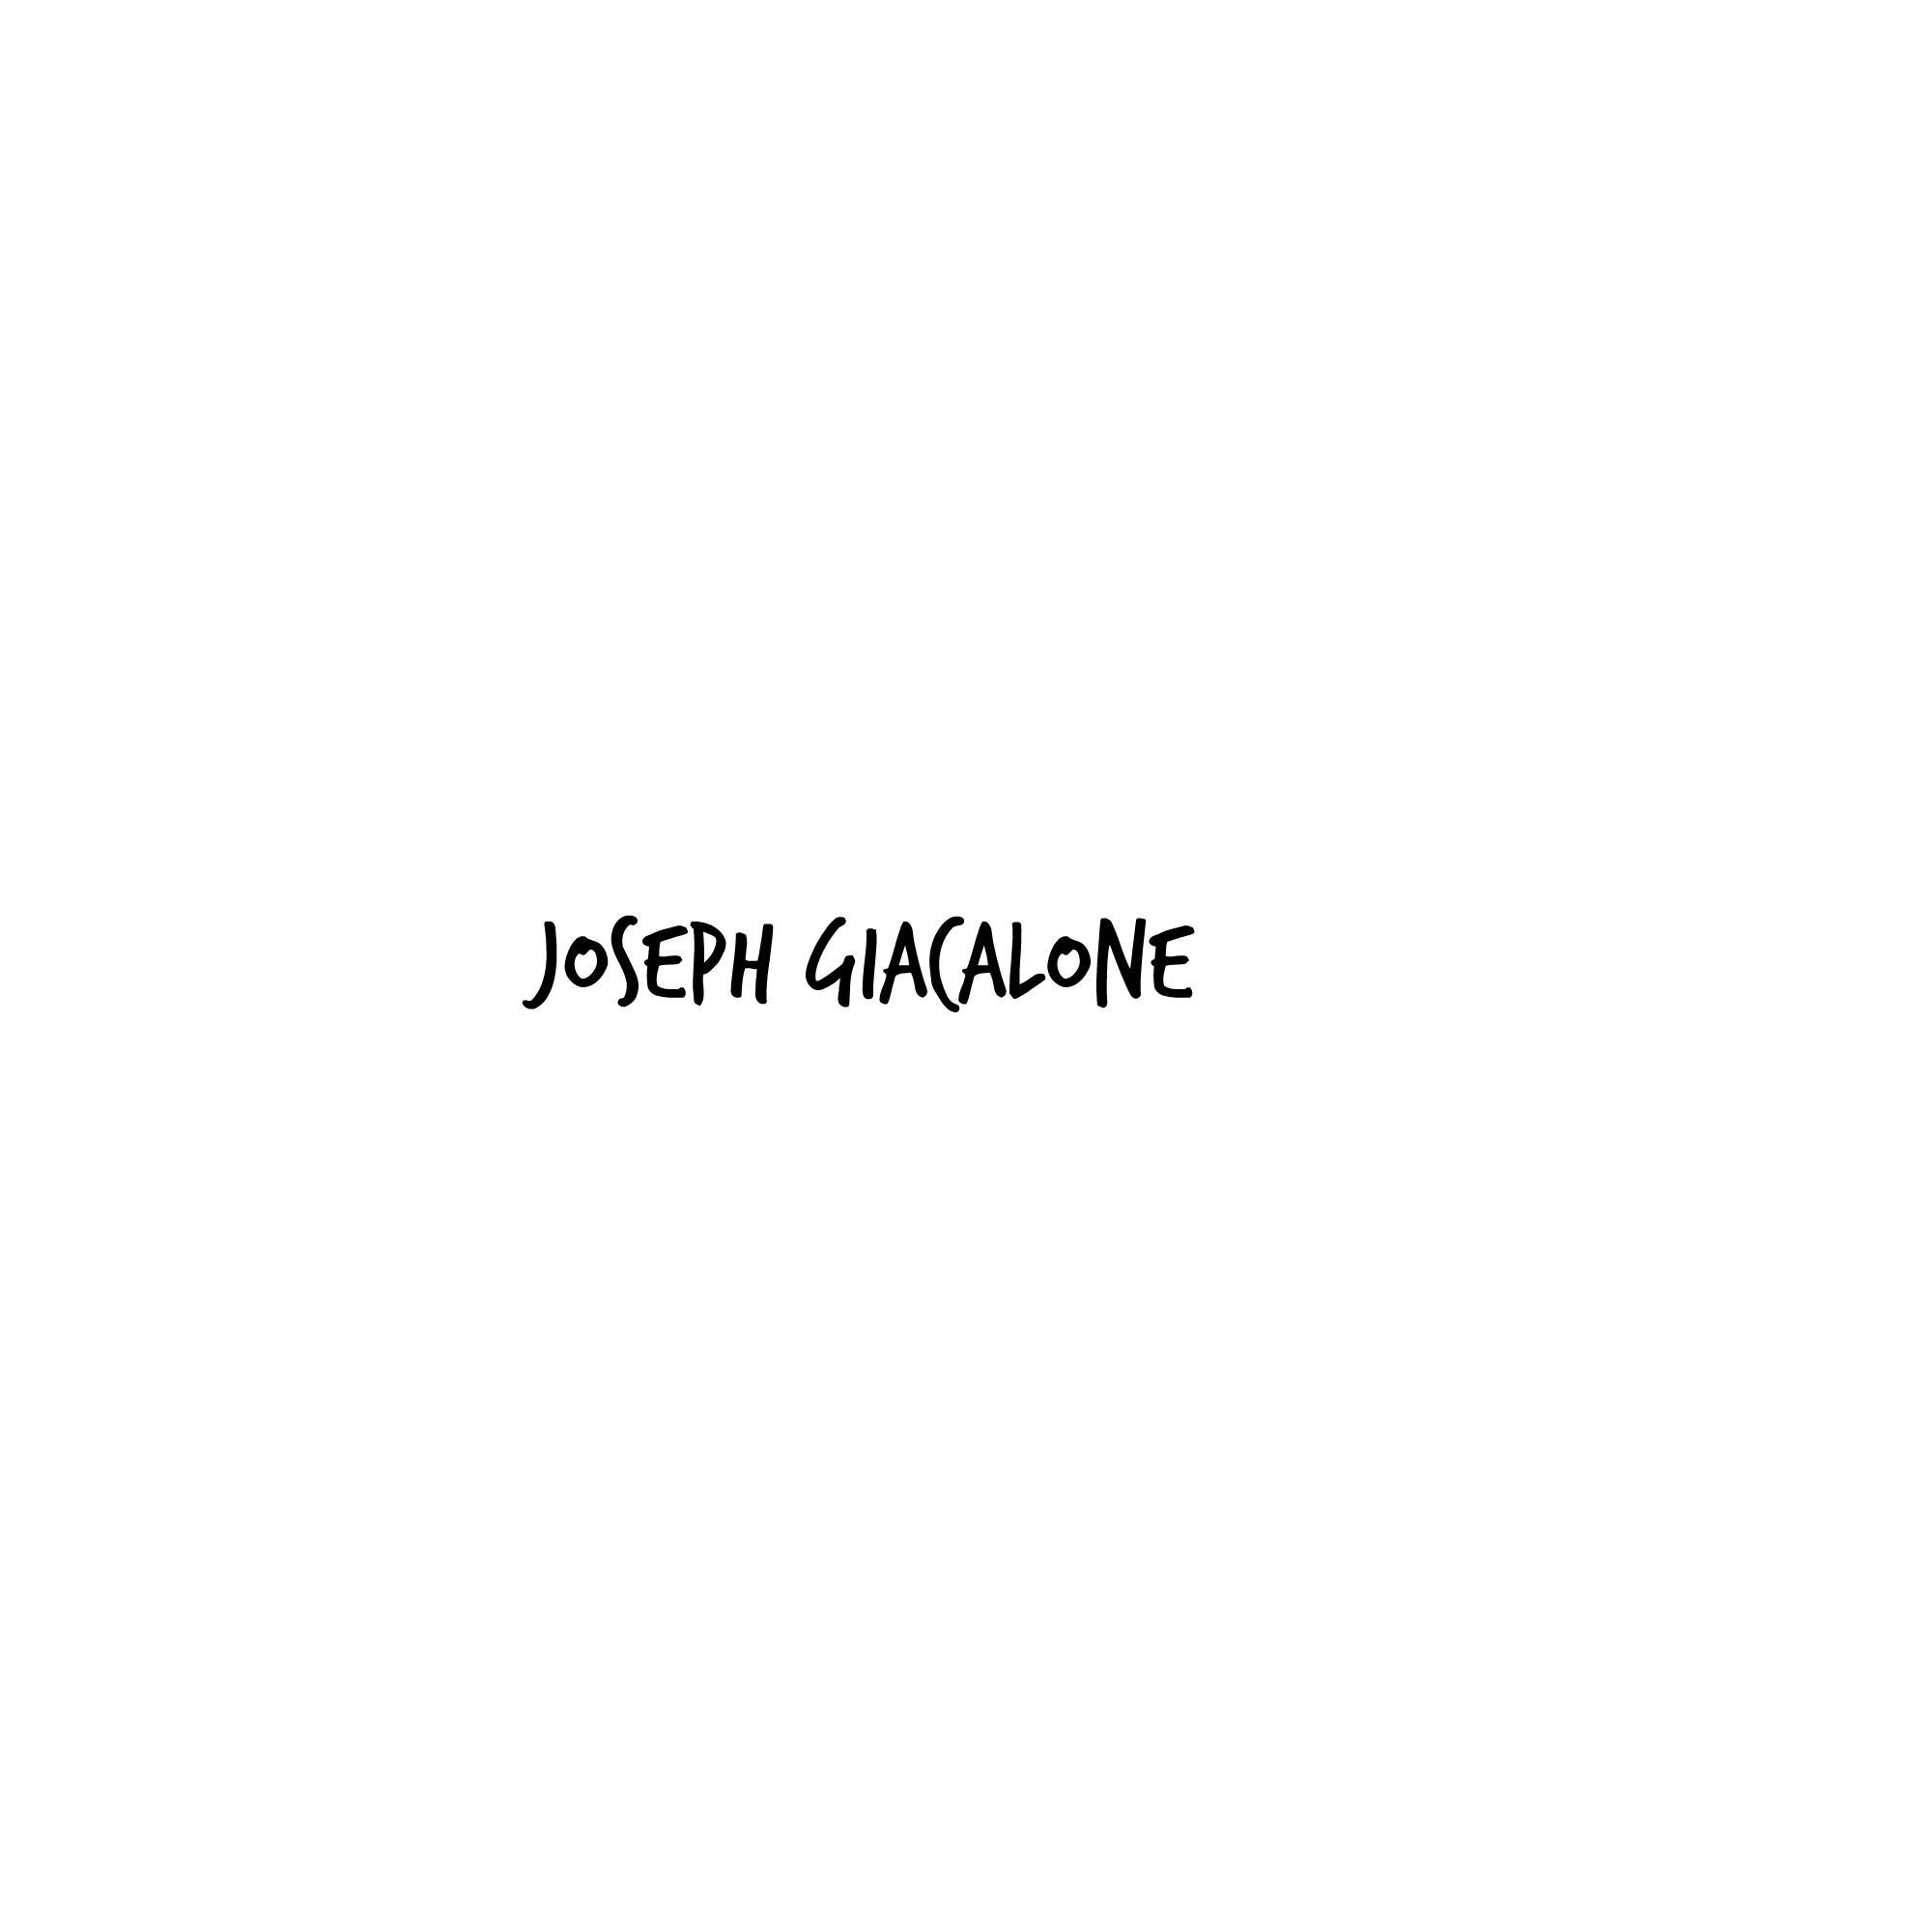 Joseph Giacalone Signature